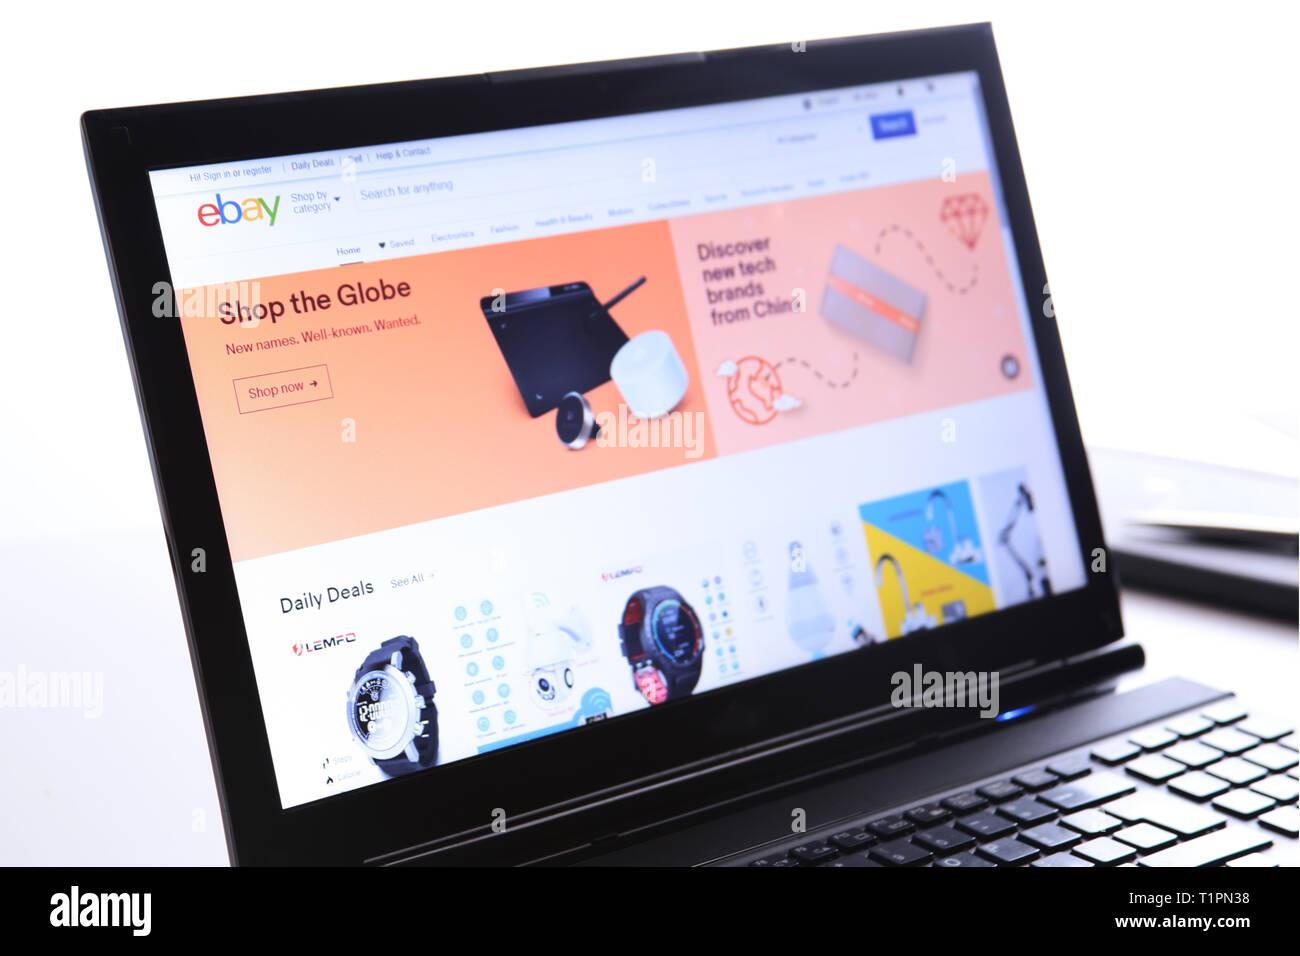 New York, USA - March 25, 2019: Illustrative Editorial of Website of eBay.com. eBay logo visible on display screen. Stock Photo